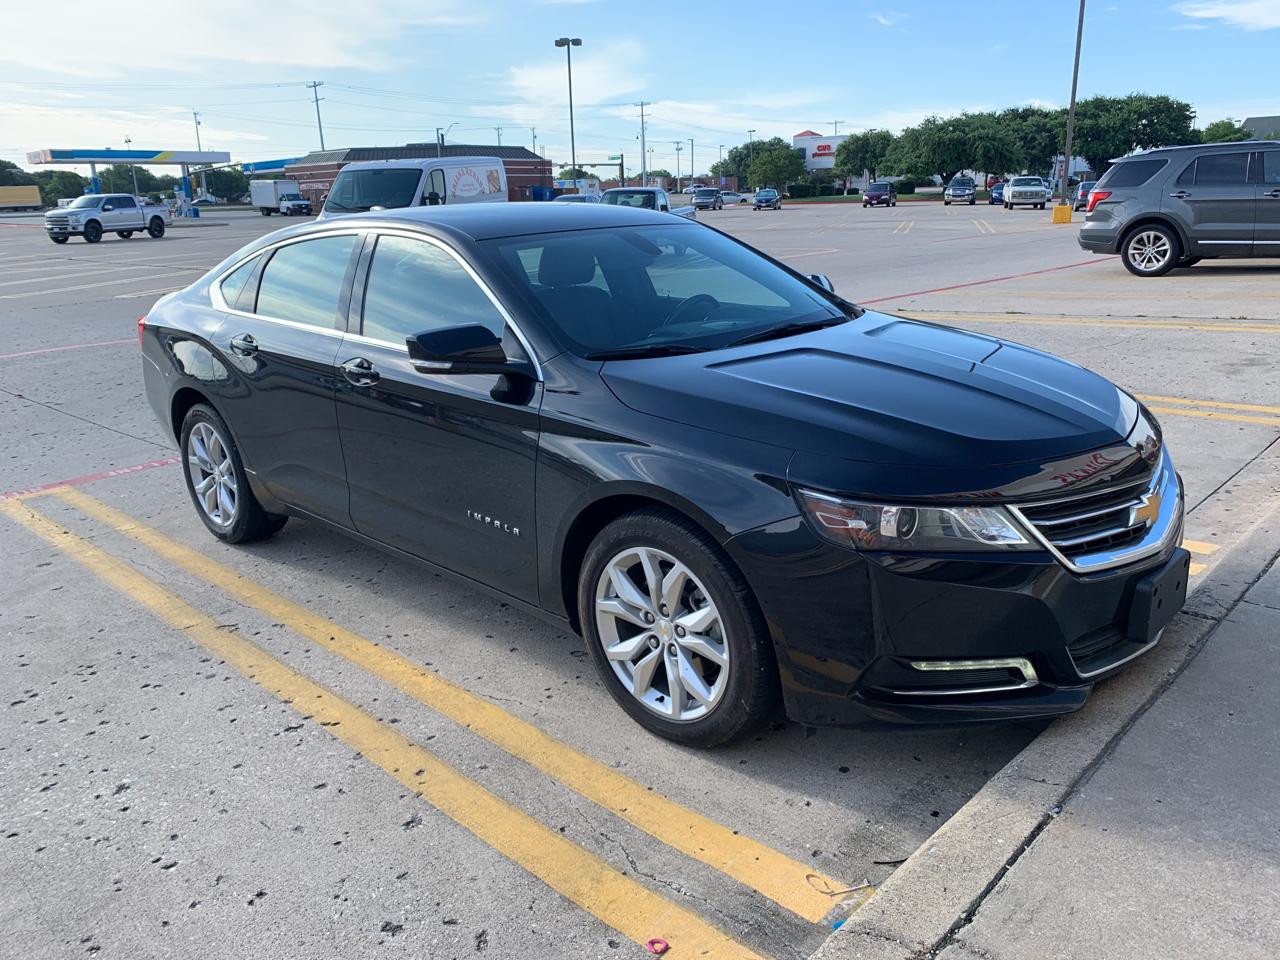 Chevrolet Impala 4dr Sdn LT w/1LT 2018